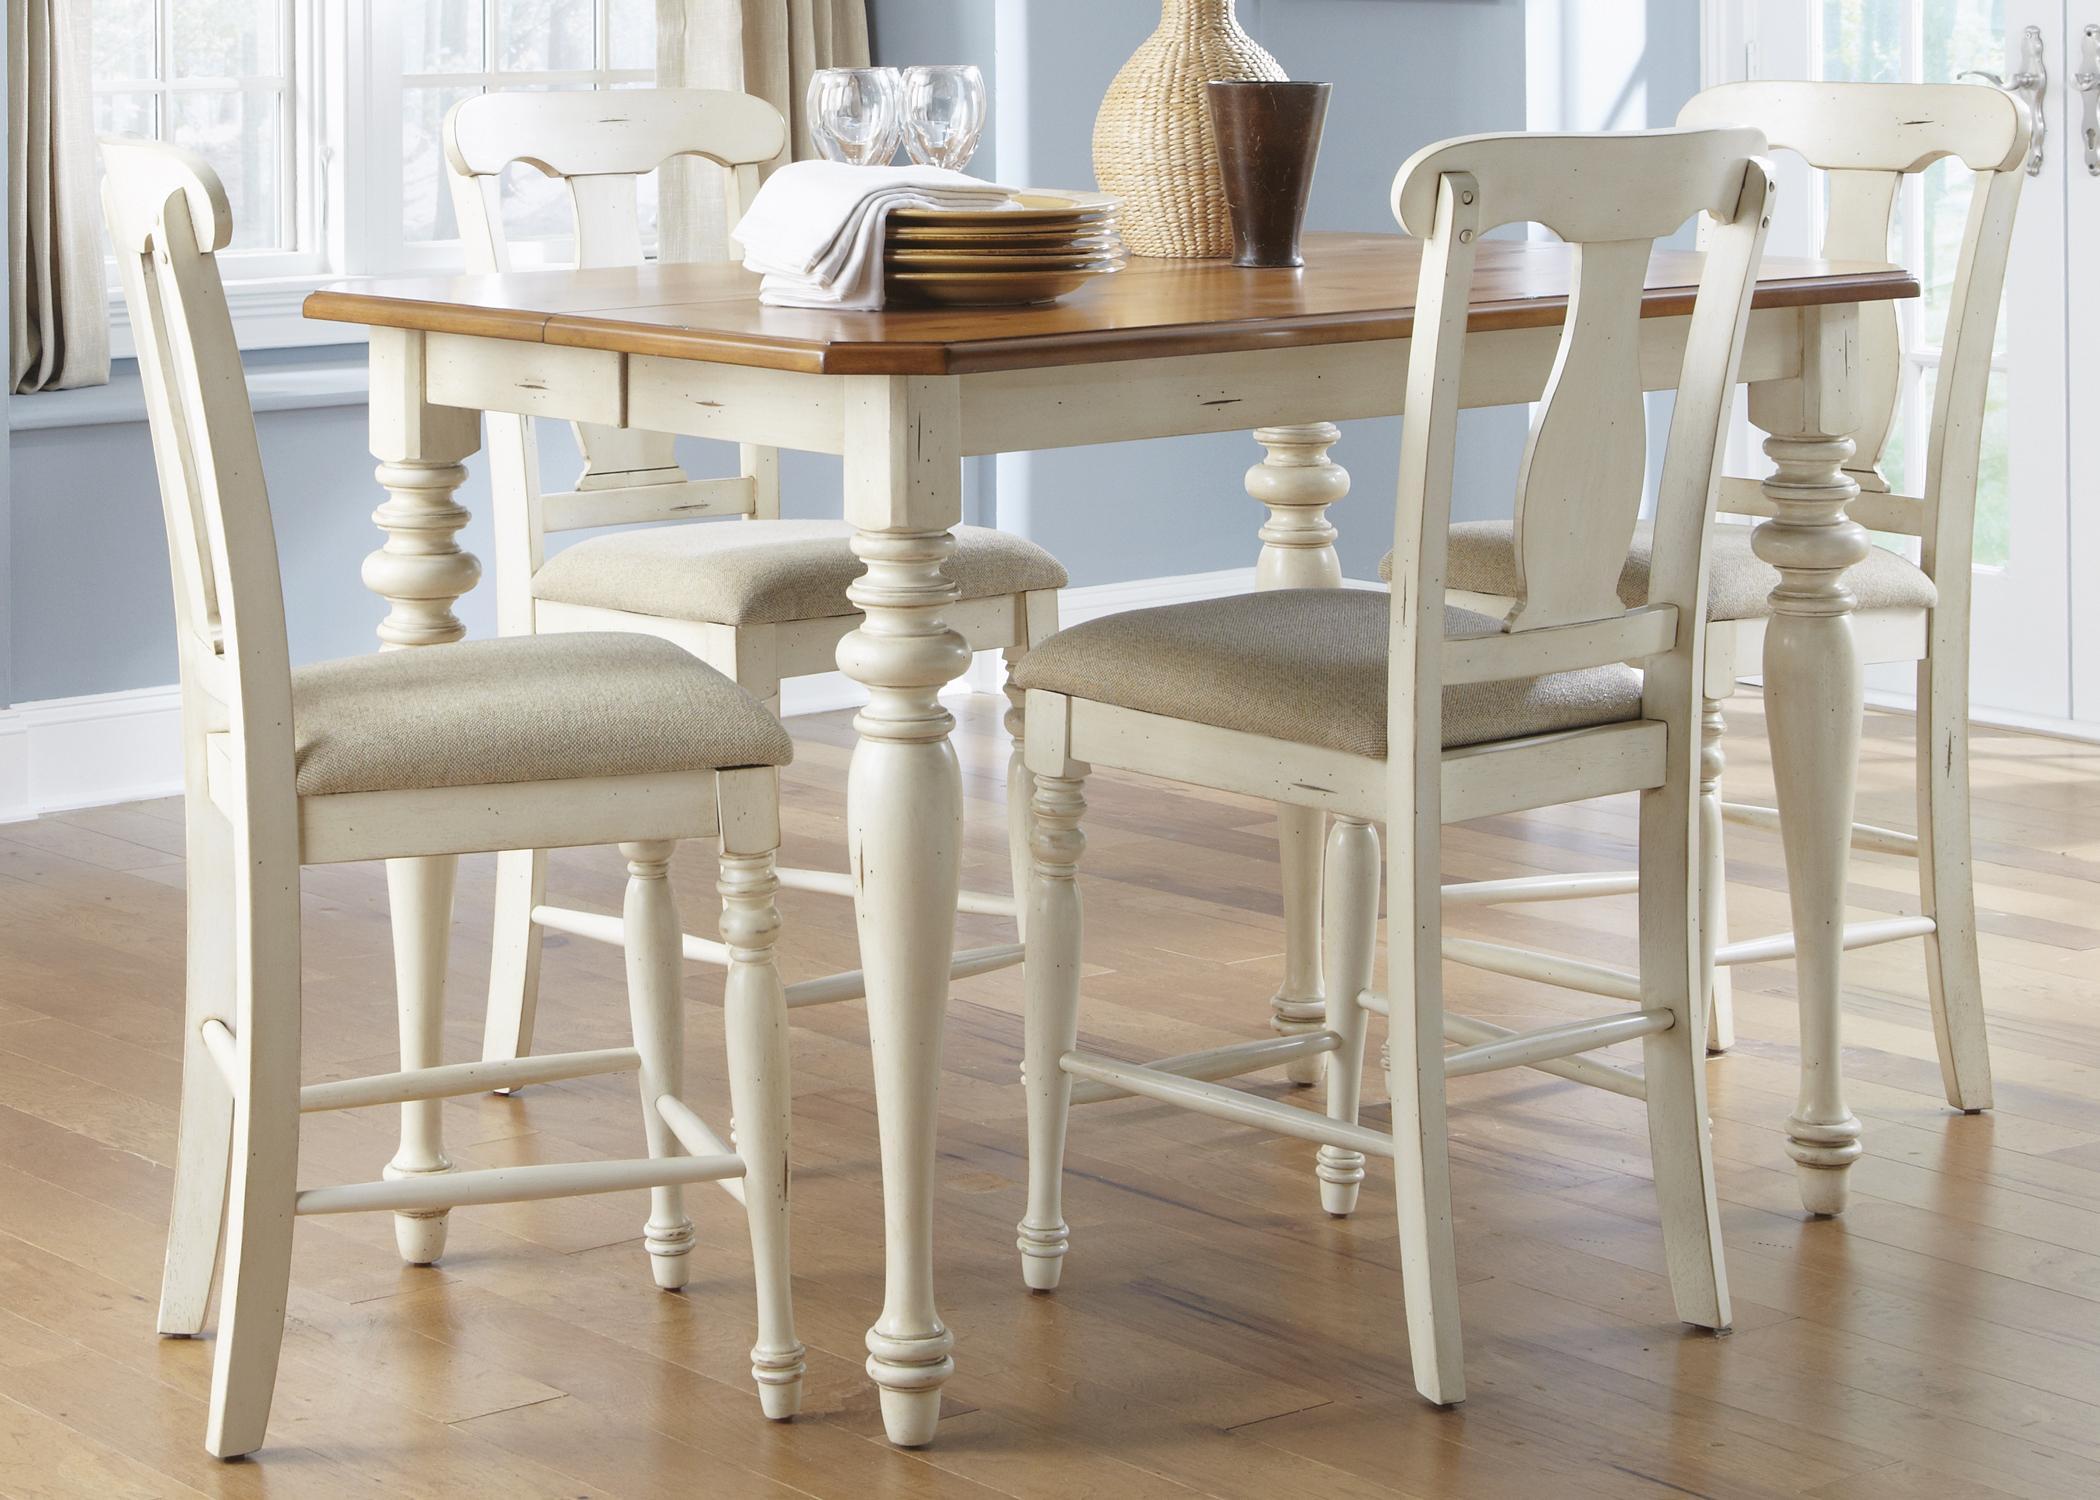 Ocean Isle  5-Piece Gathering Height Dining Set  by Liberty Furniture at Lapeer Furniture & Mattress Center